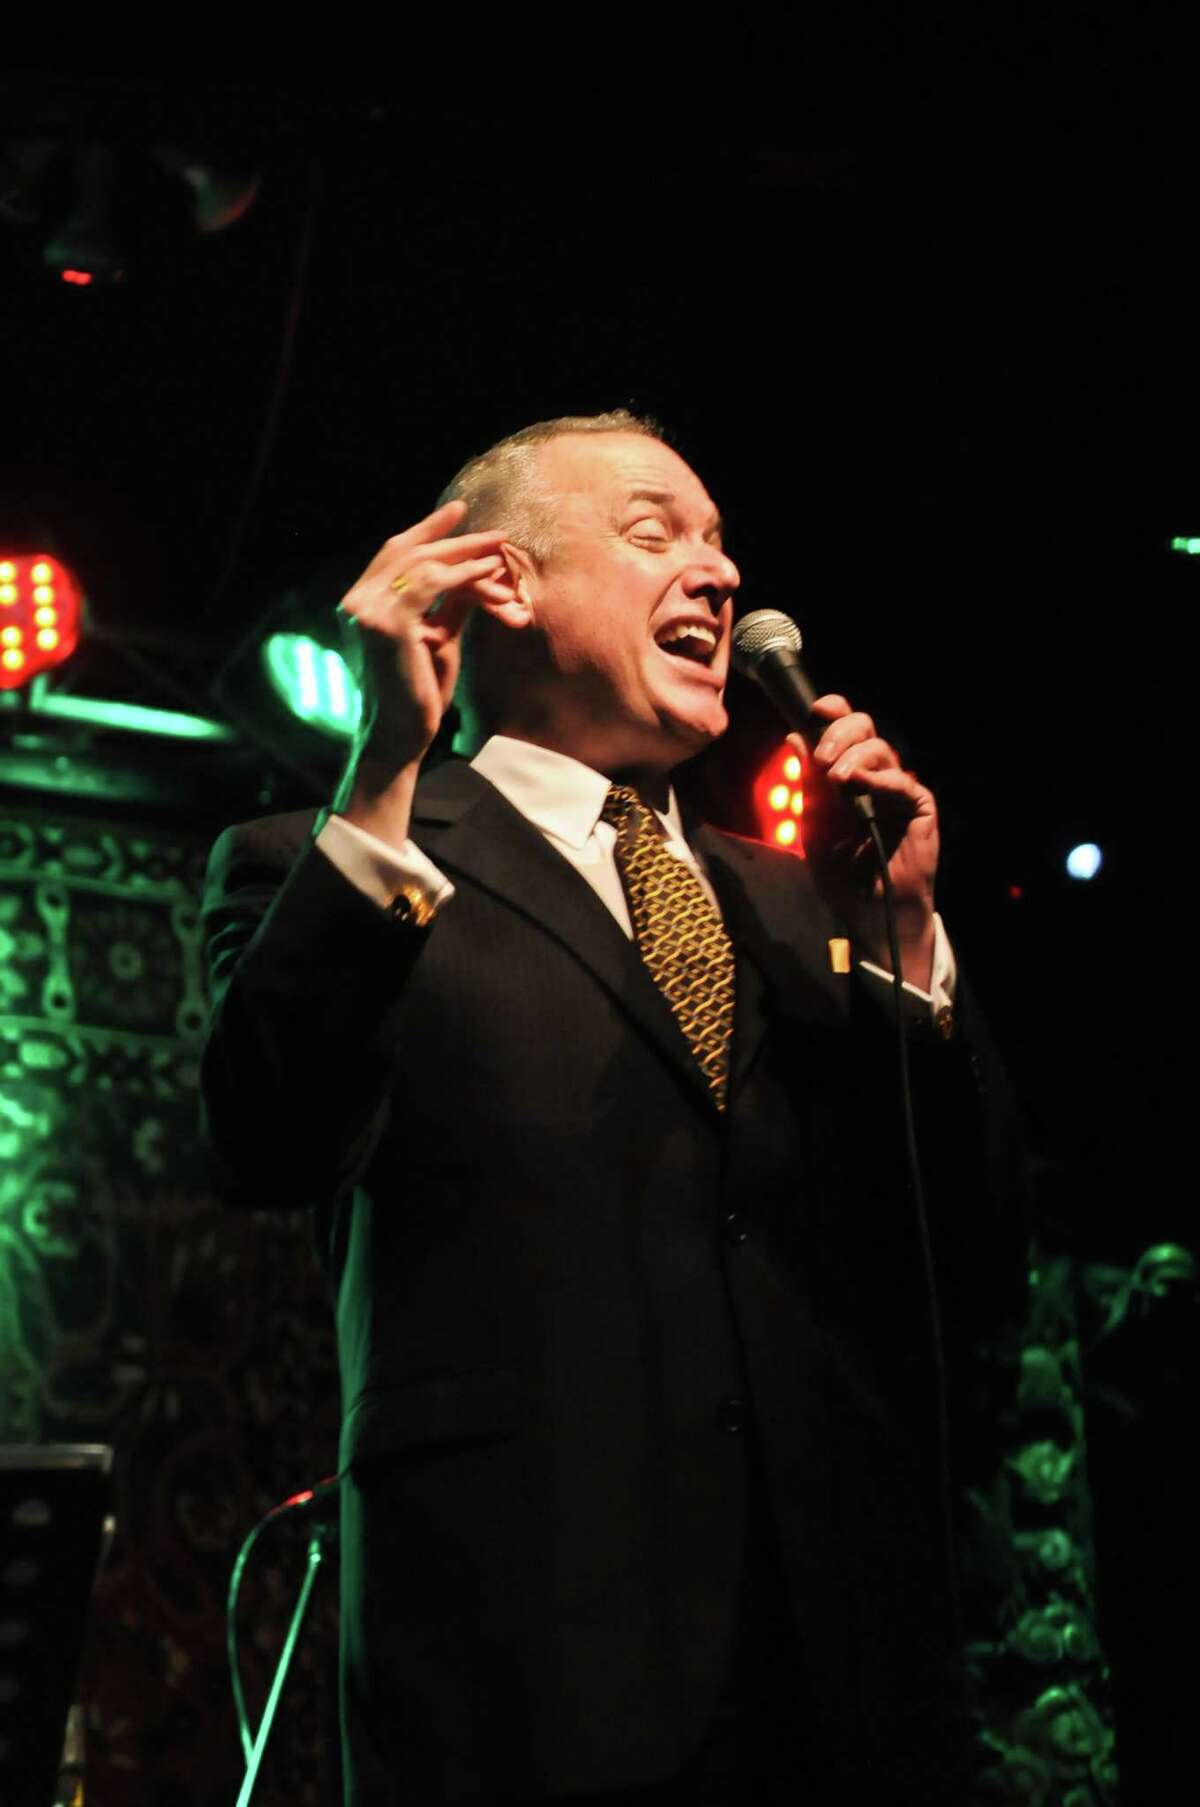 Jazz crooner Ken Slavin gives an annual holiday performance at Sam's Burger Joint.